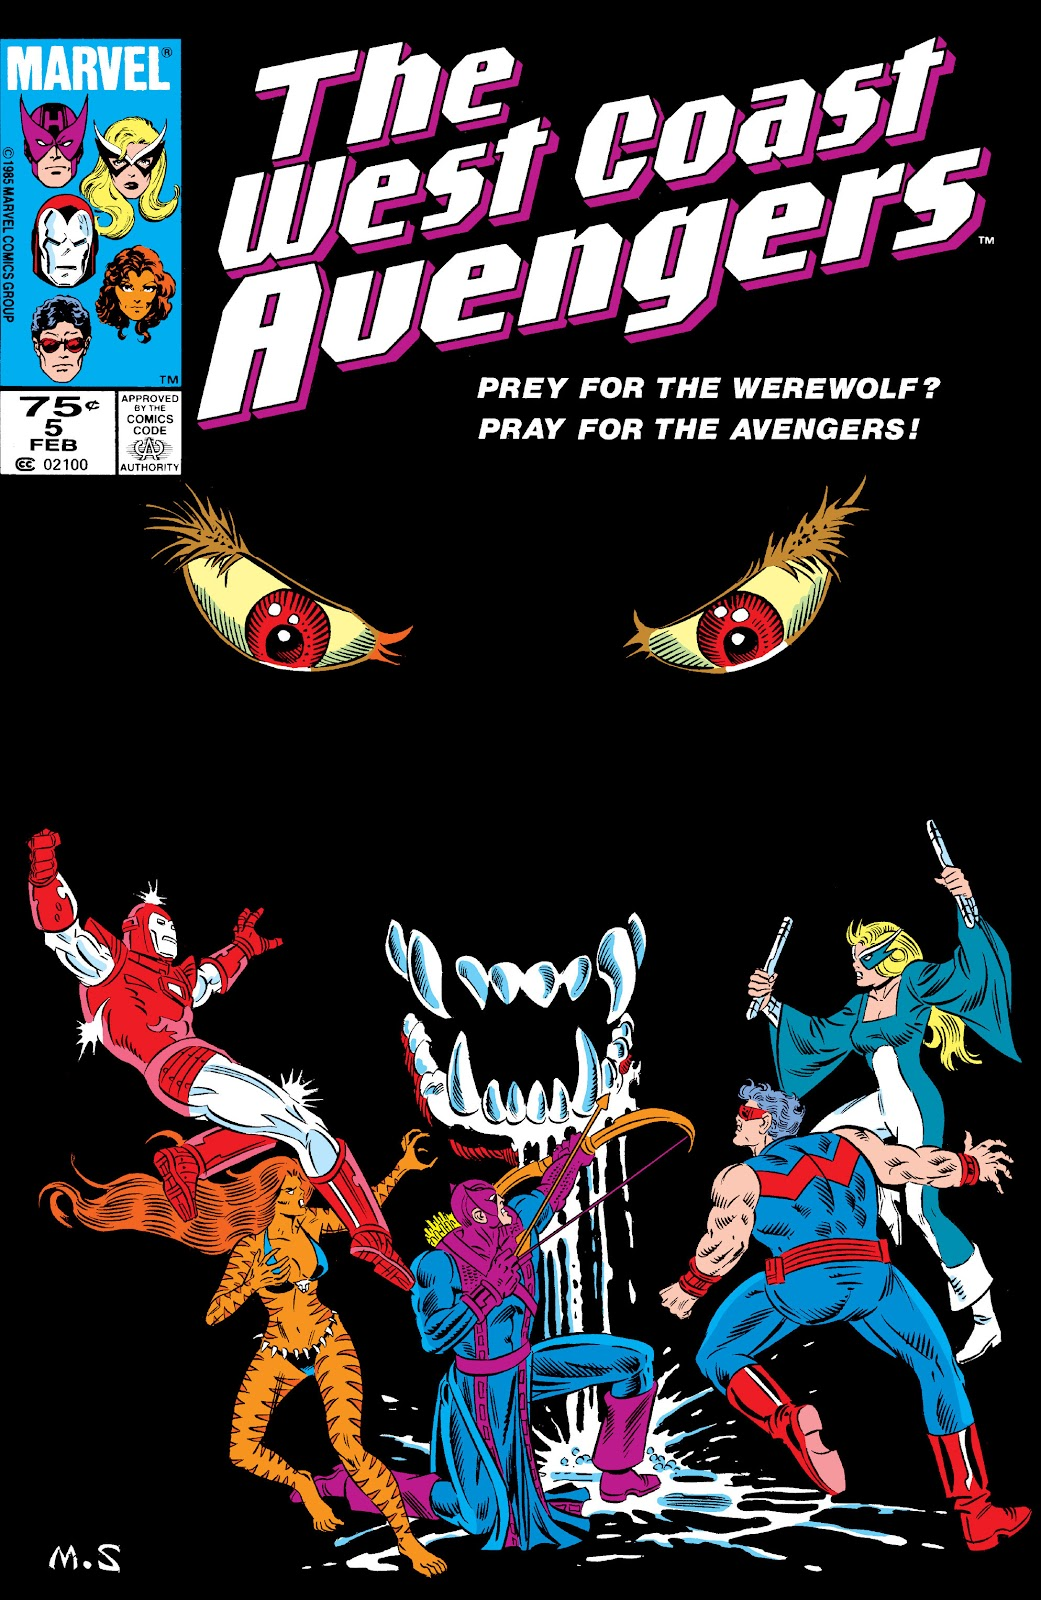 West Coast Avengers (1985) 5 Page 1